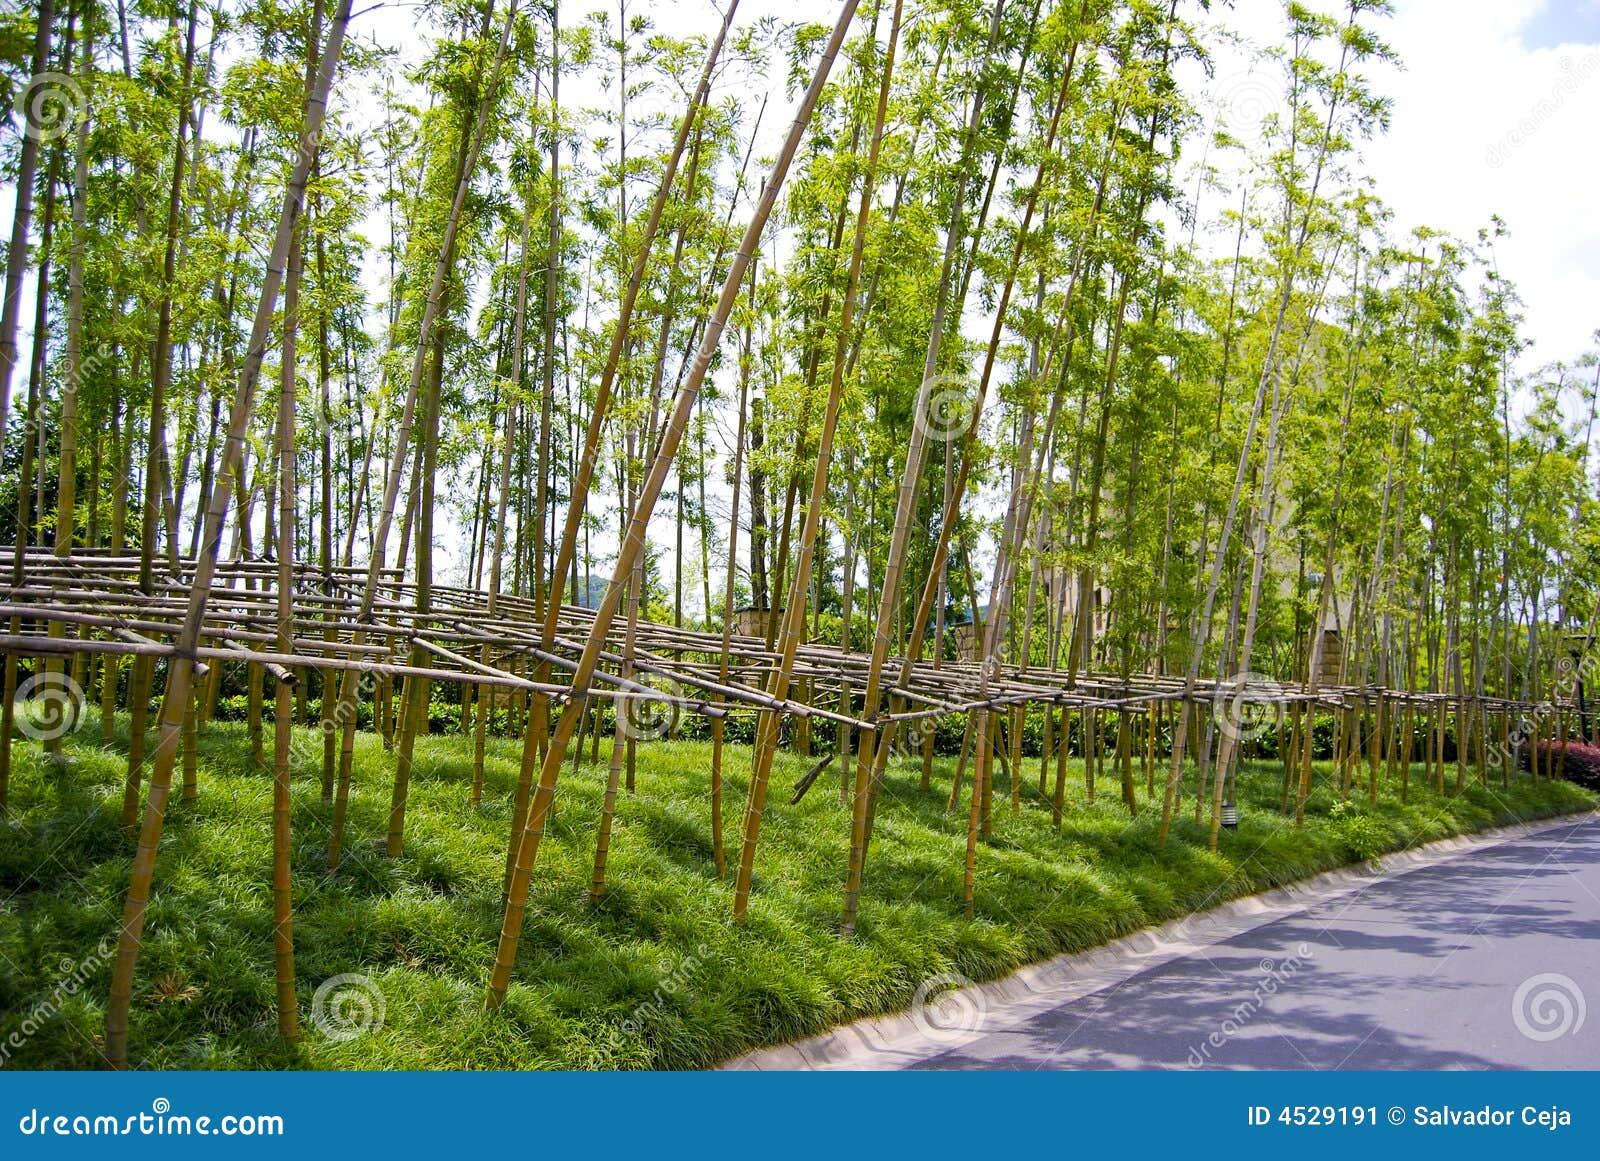 Jard n de bamb - Jardin de bambu talavera ...